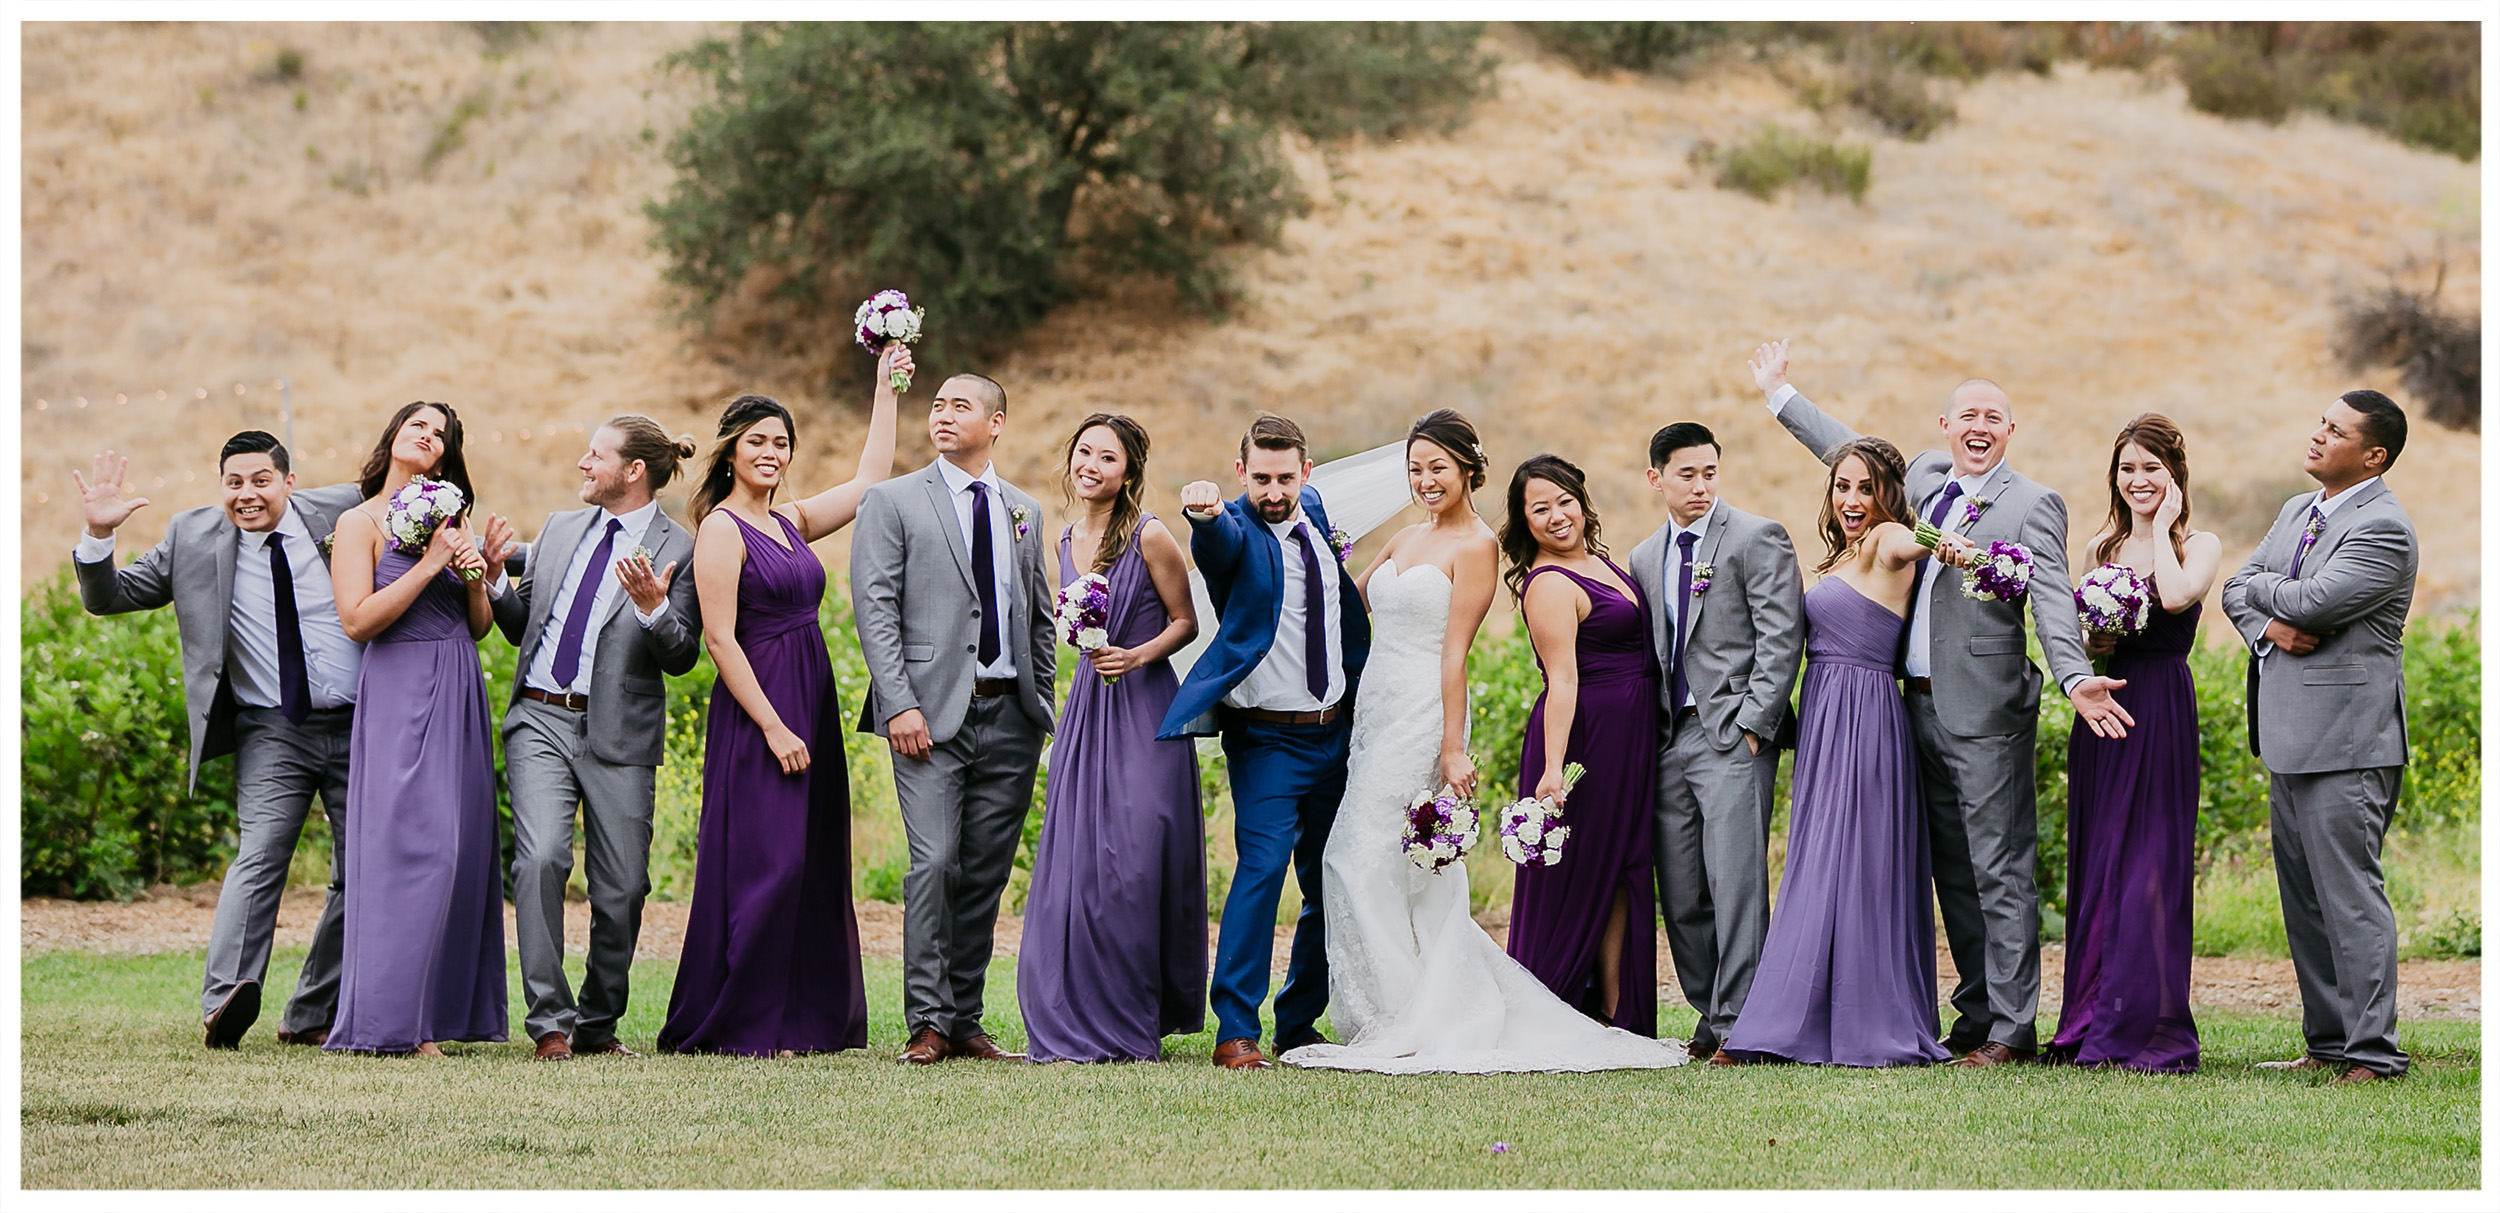 PG-Owl-Creek-Farms-Temecula-Wedding-Photography-44.jpg